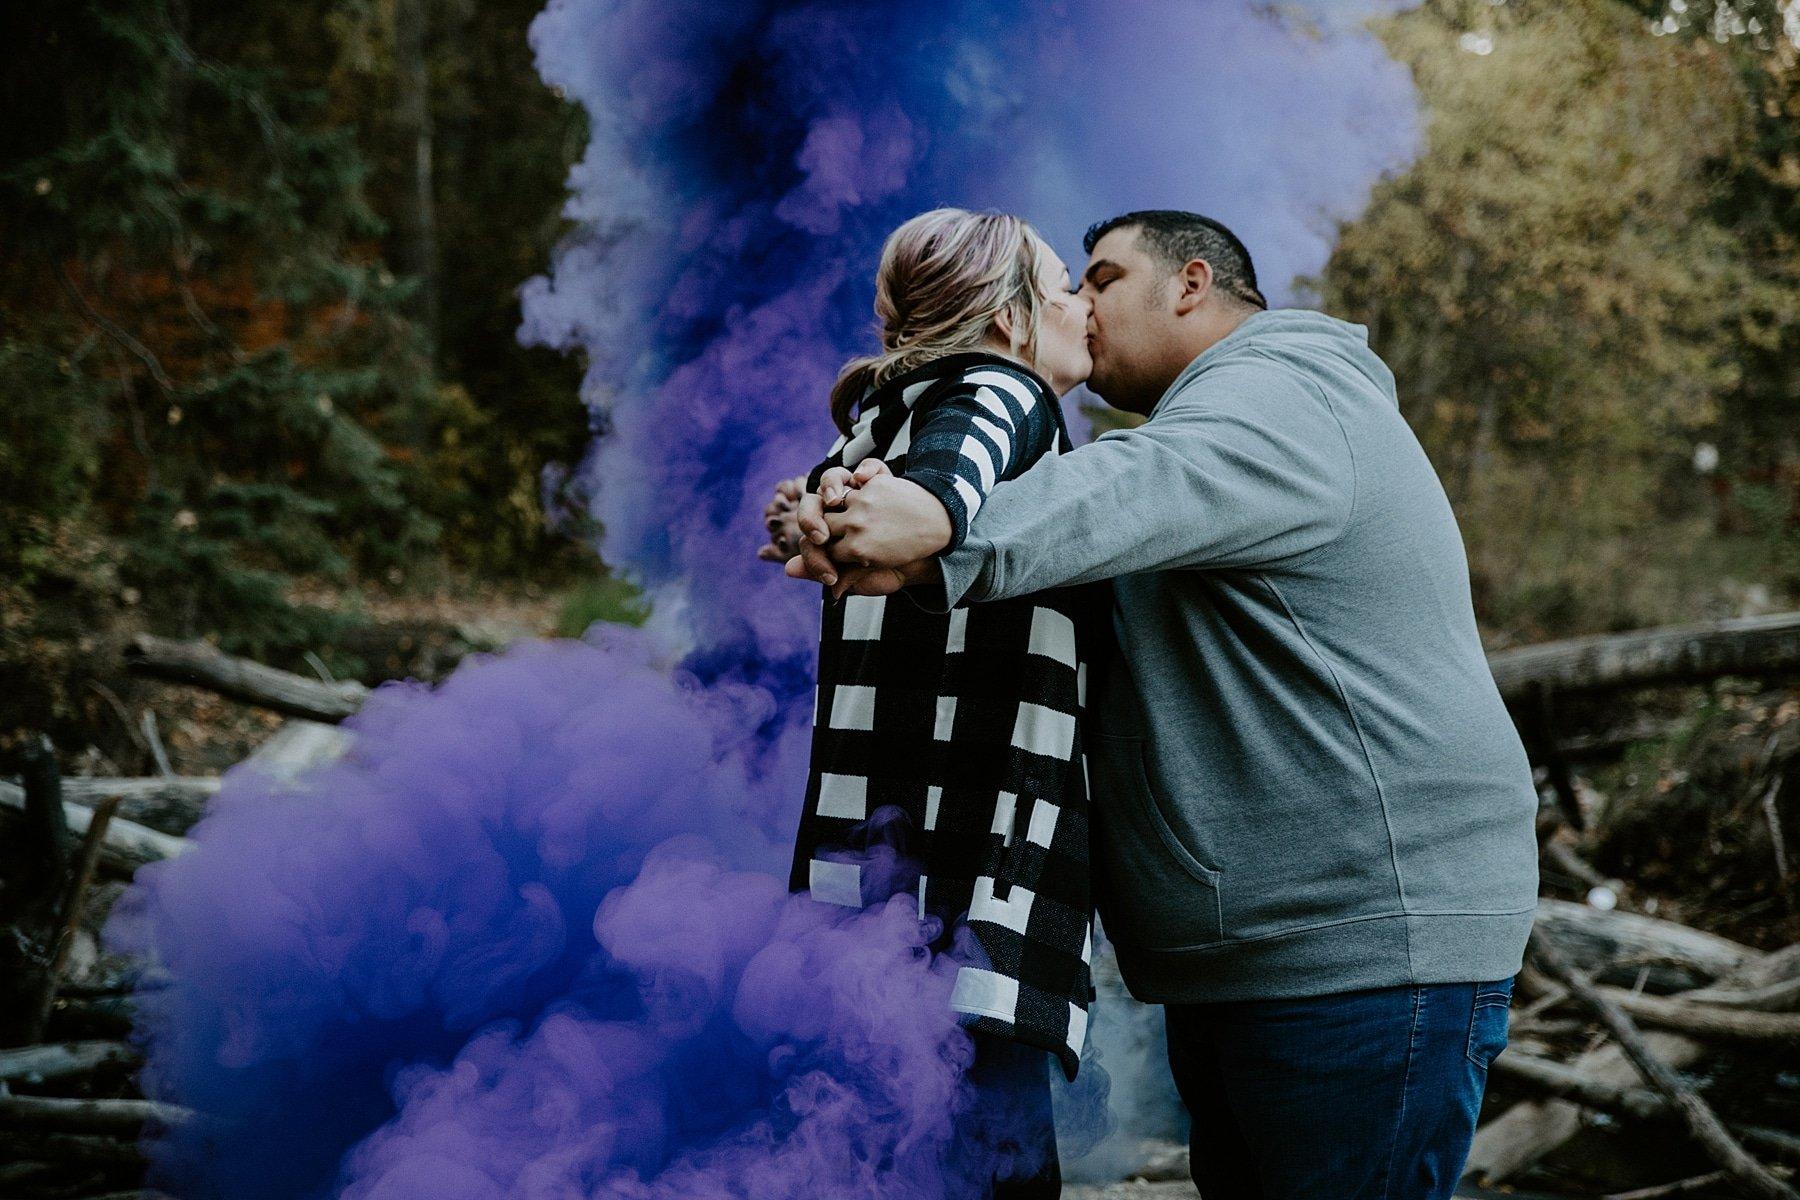 Smoke bomb engagement